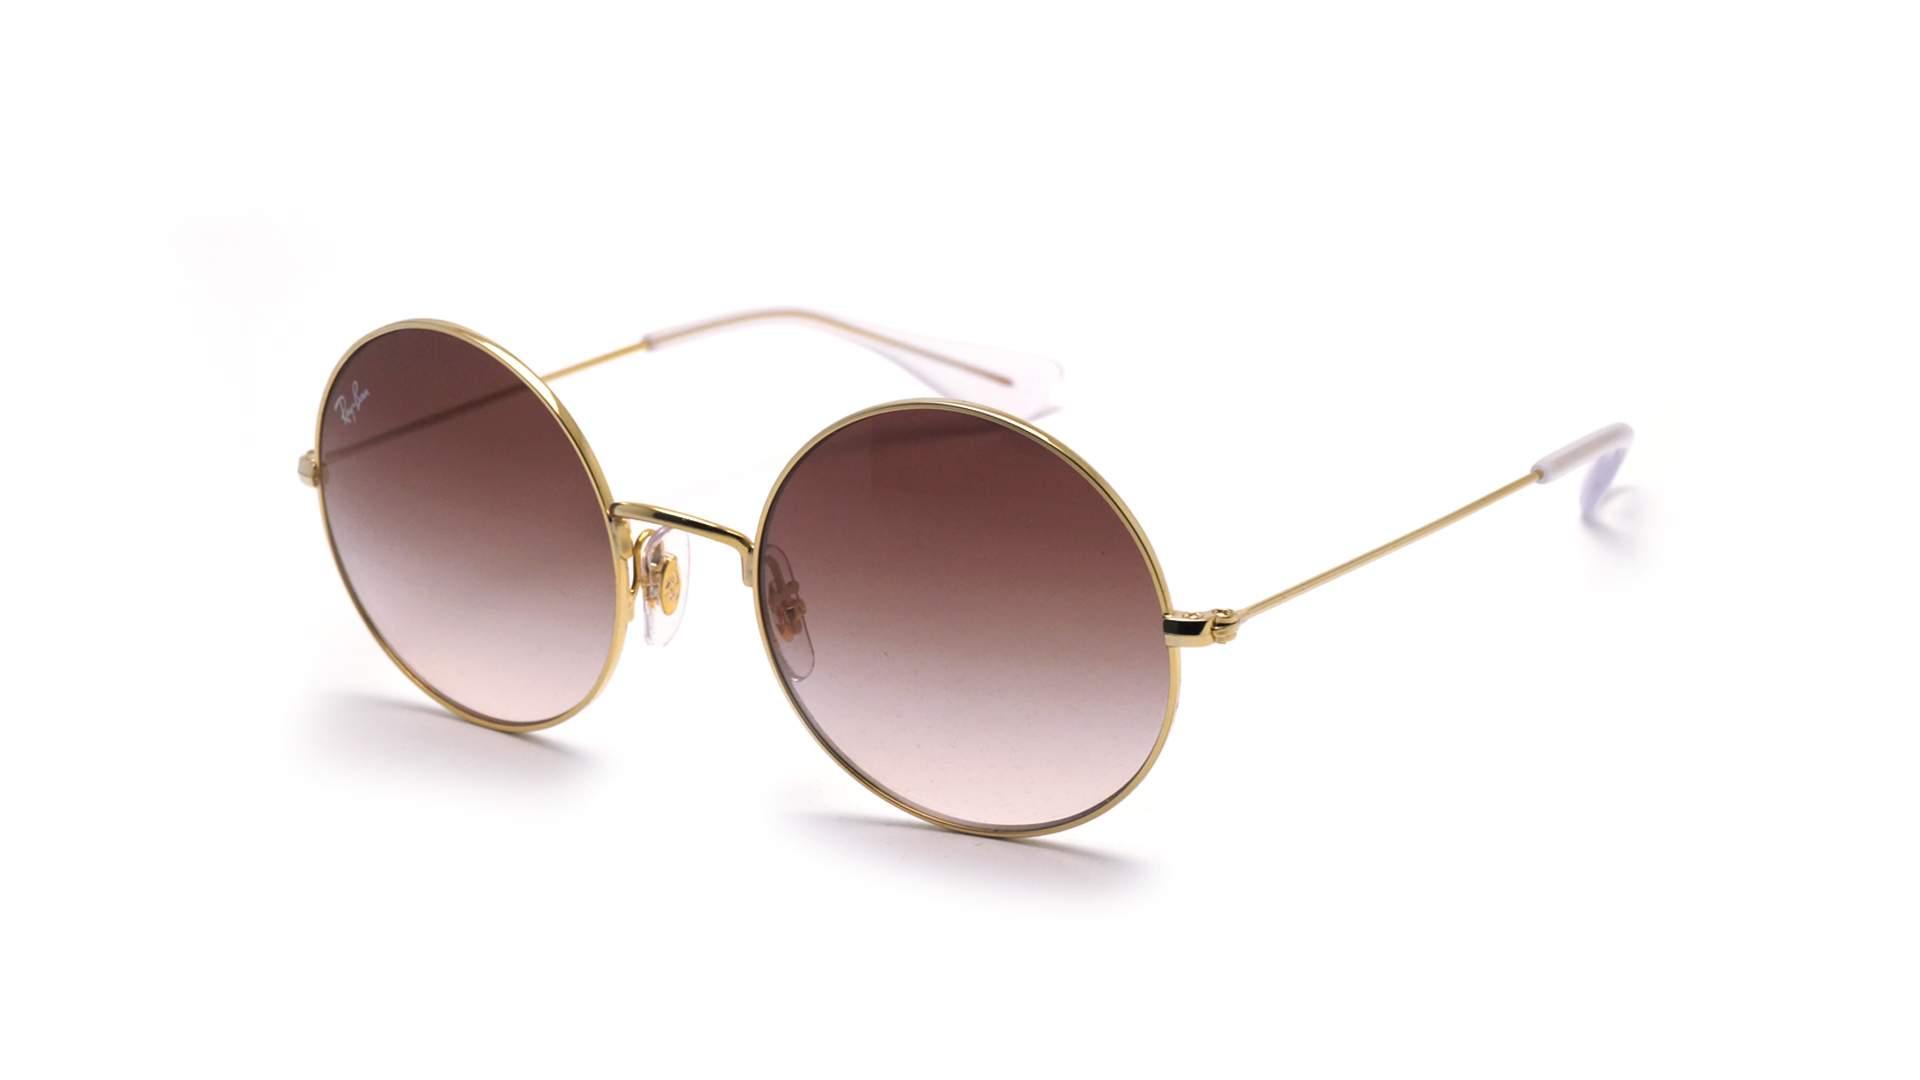 54f74bf6bd Sunglasses Ray-Ban Ja-jo Gold RB3592 001 13 55-20 Large Gradient